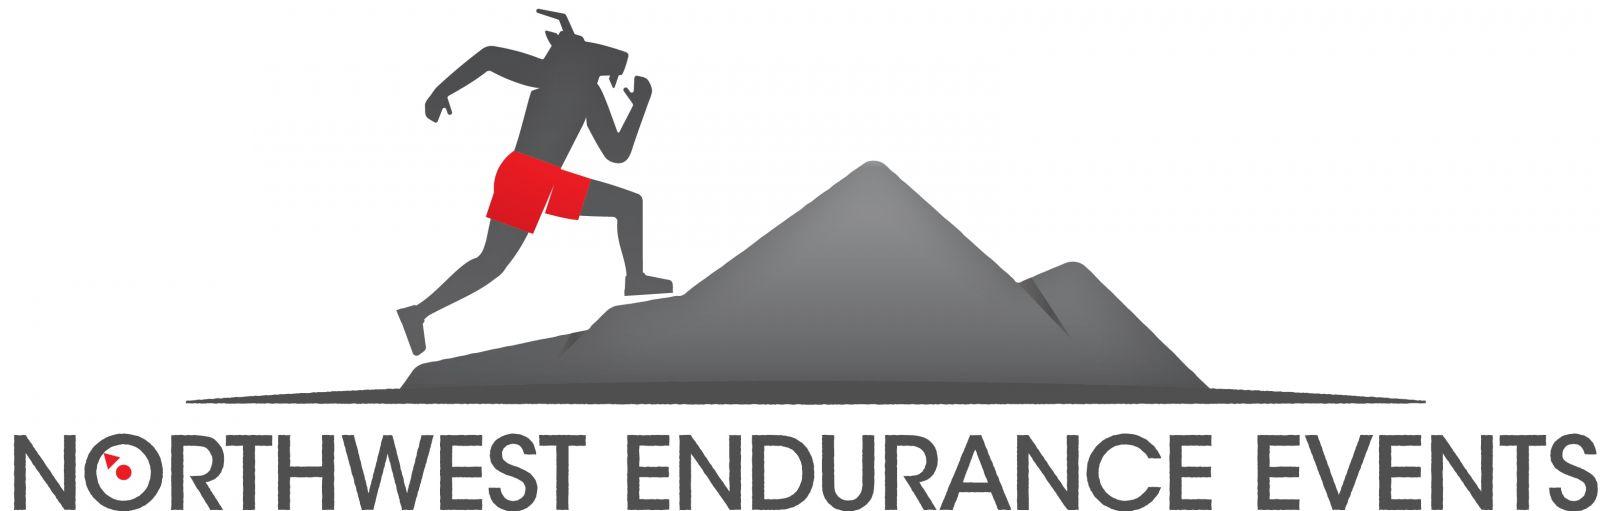 RaceThread.com Last Chance Marathon